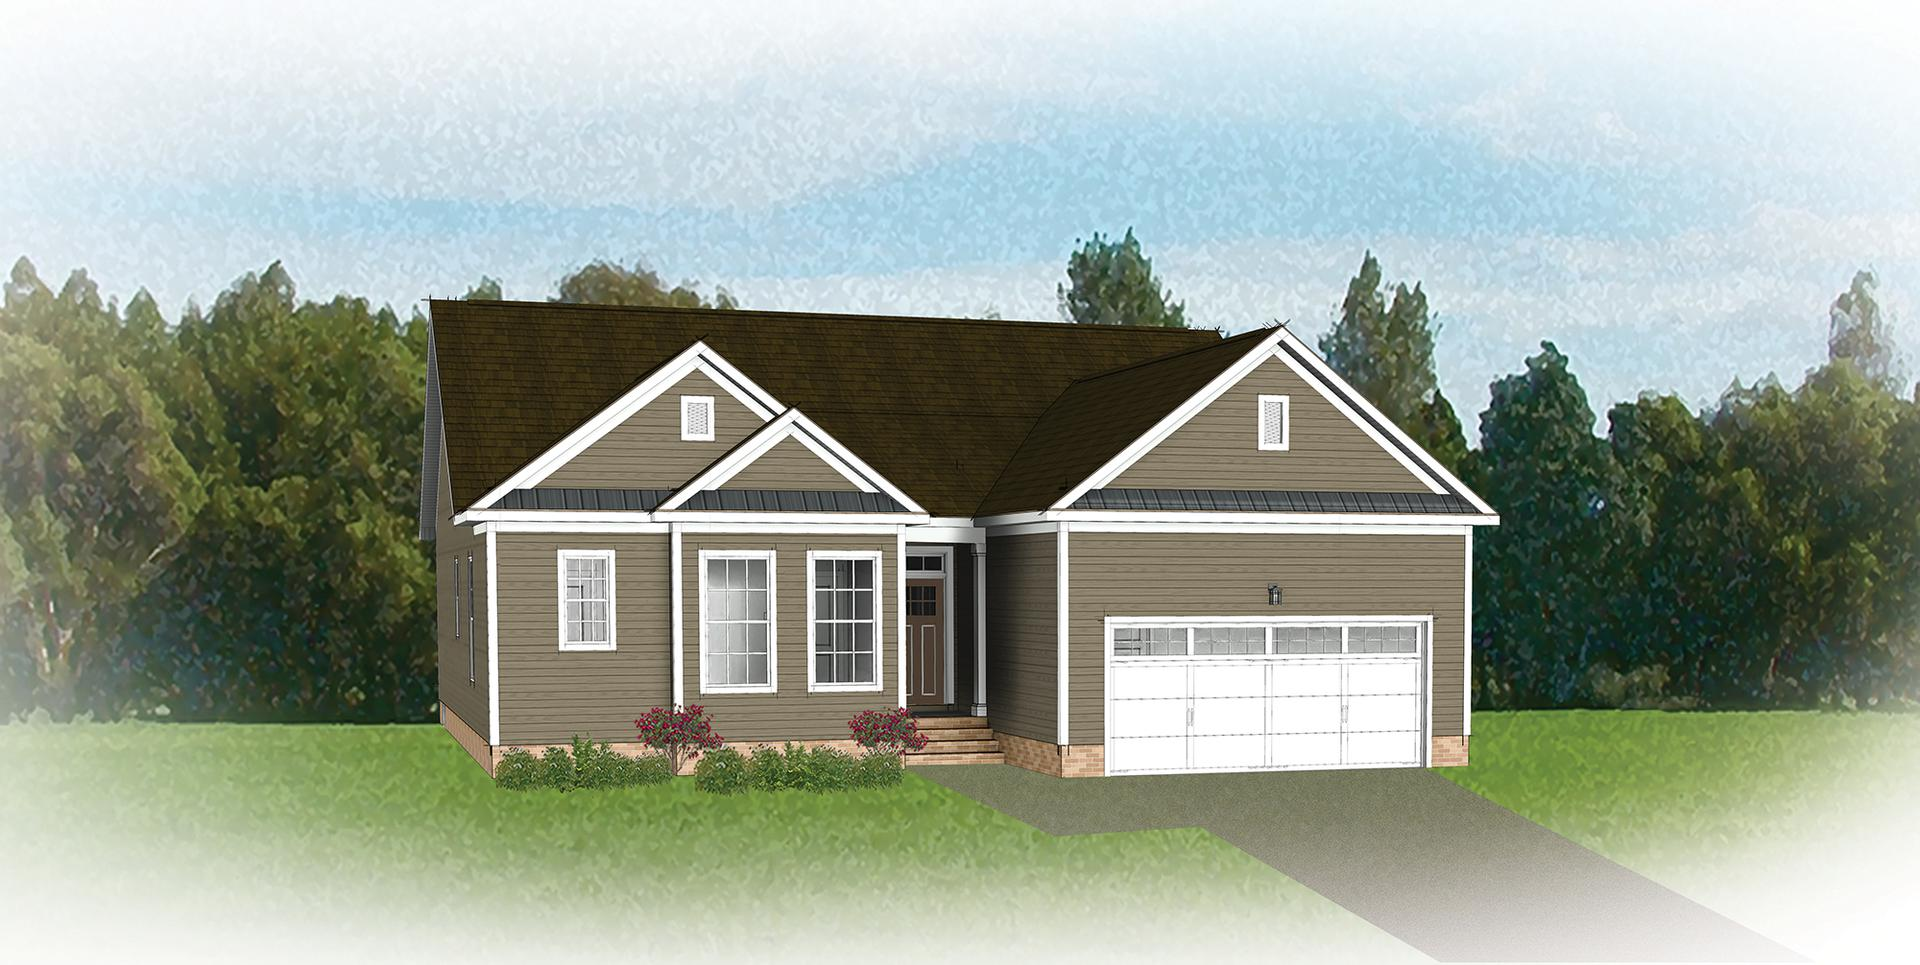 The Beverly New Home Floorplan